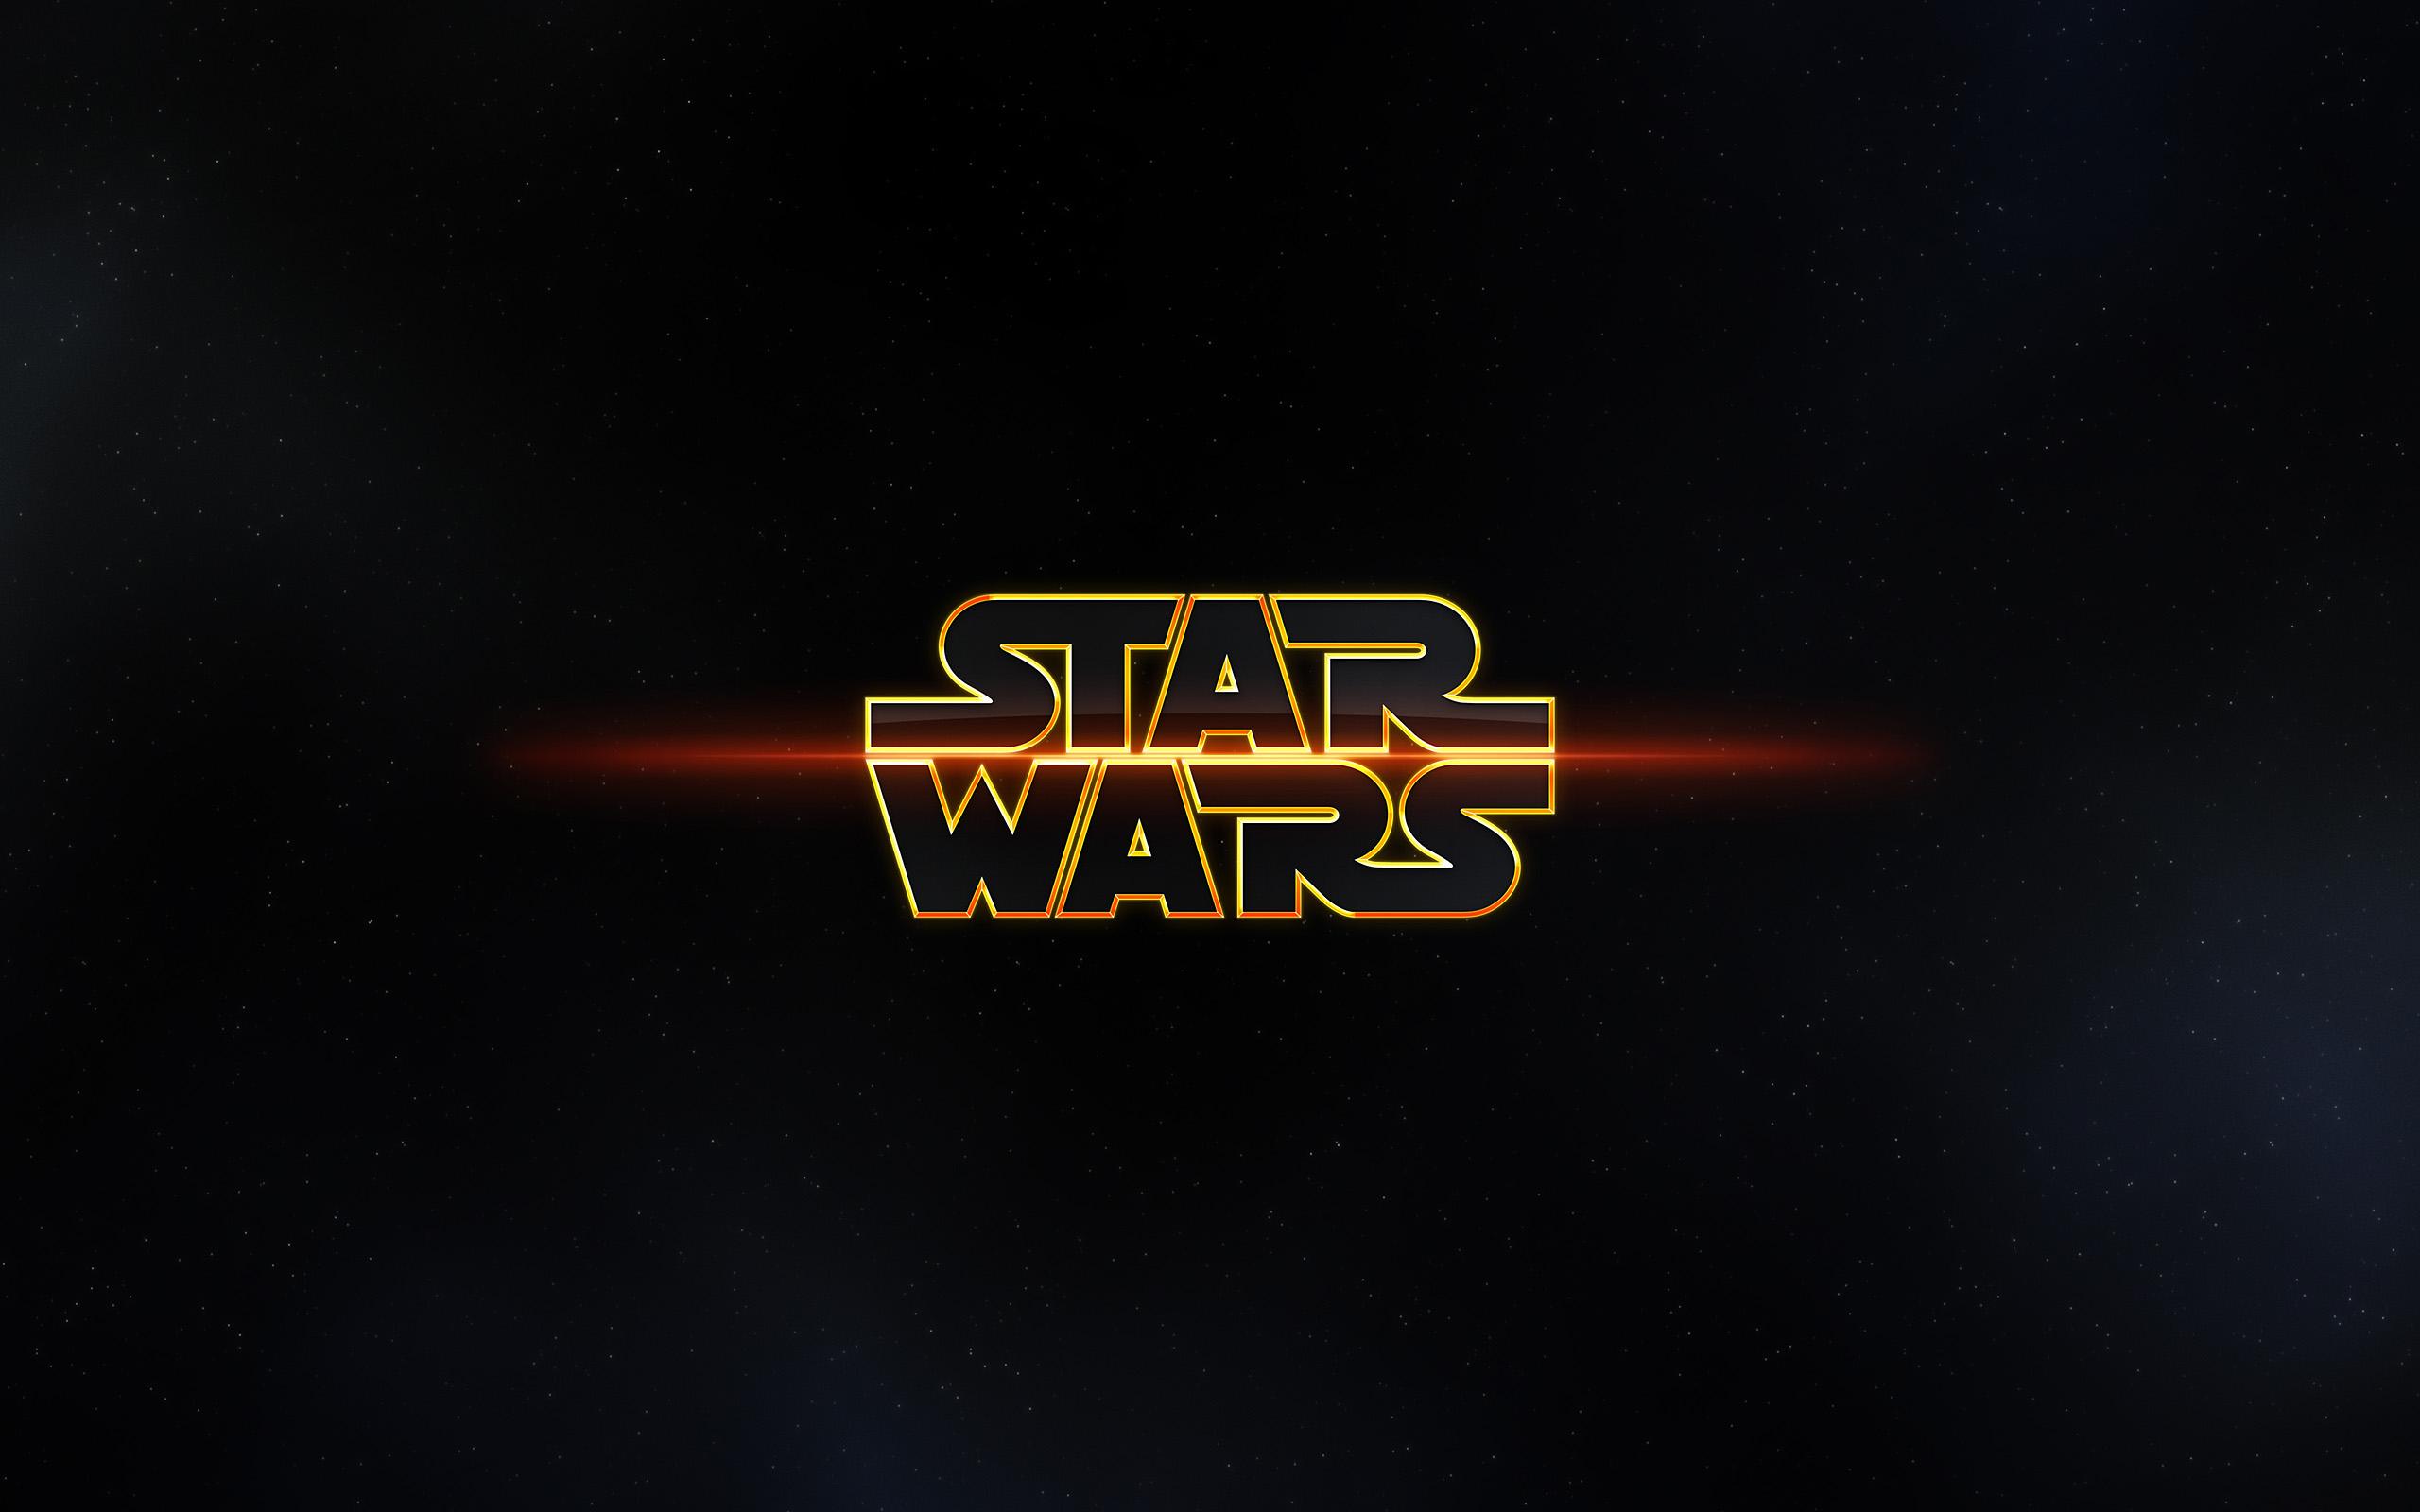 Google themes star wars - Star Wars Google Themes Epic Star Wars Google Wallpapers Epic Star